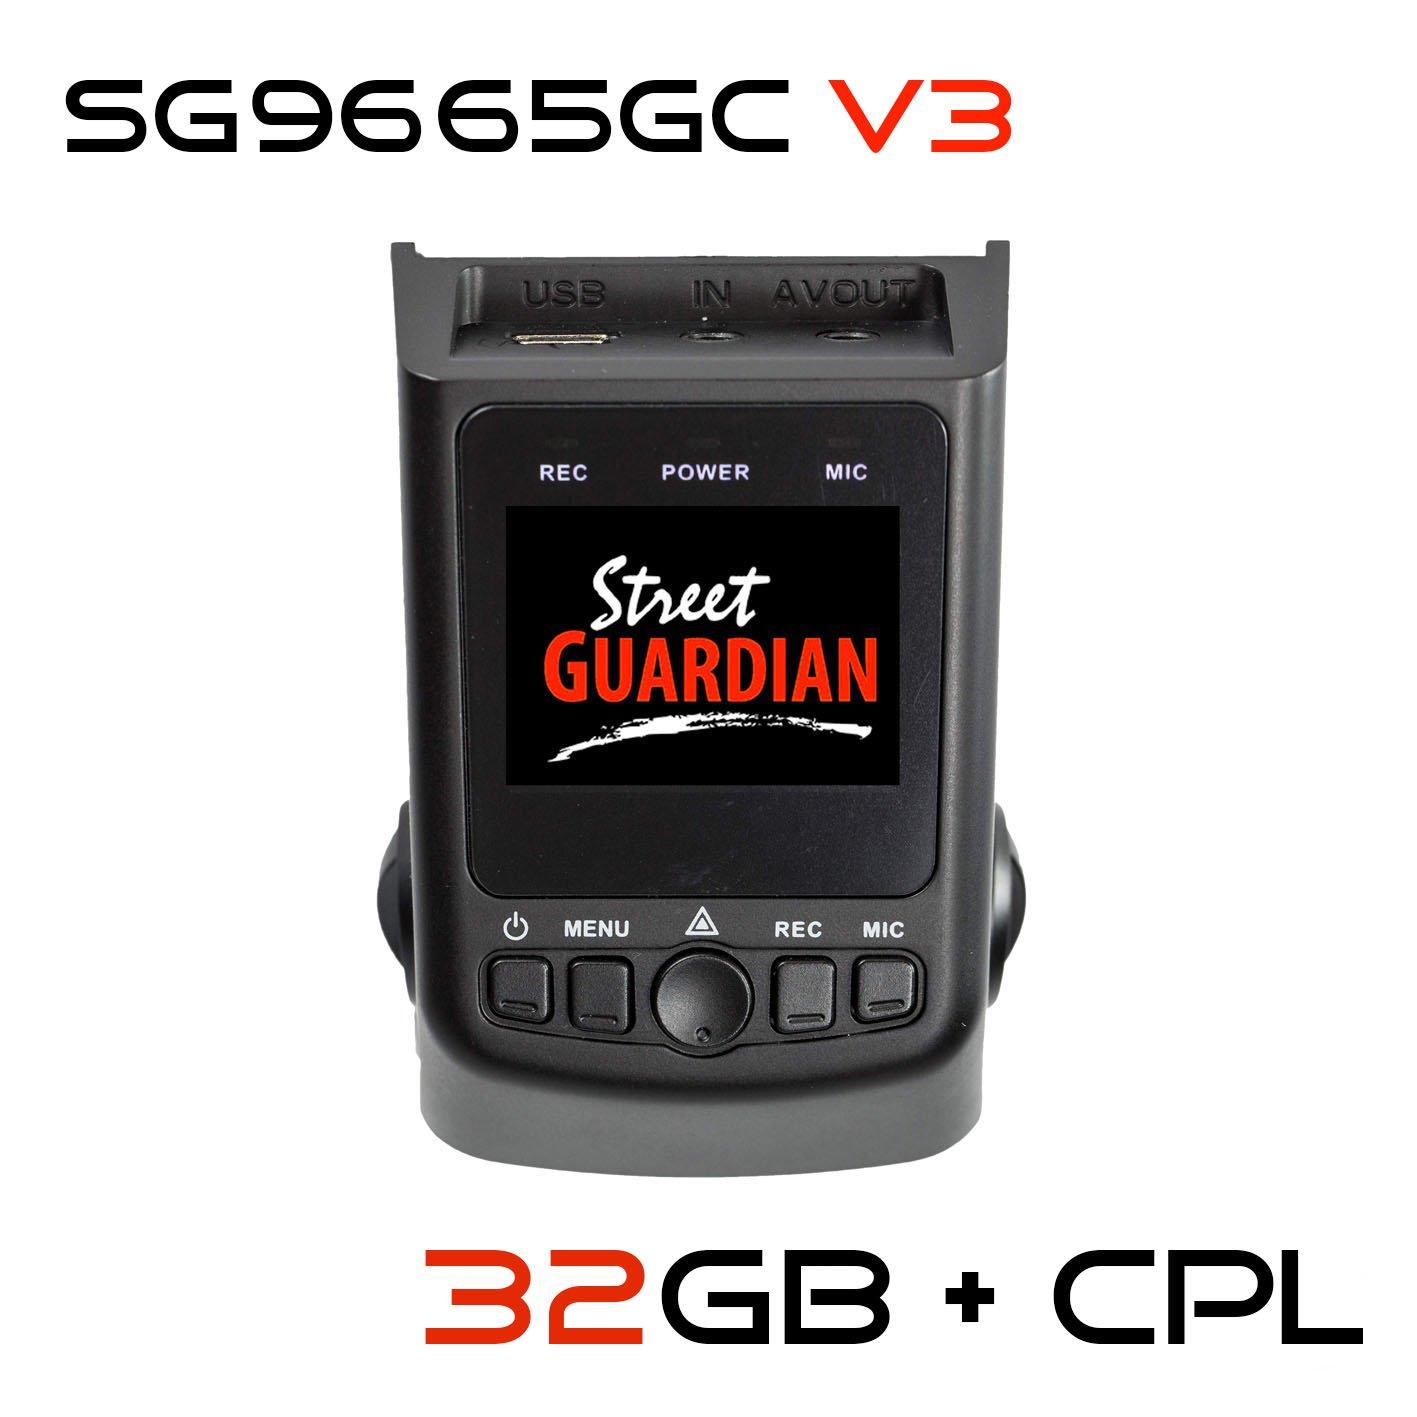 SG9665GC V3 32GB + CPL